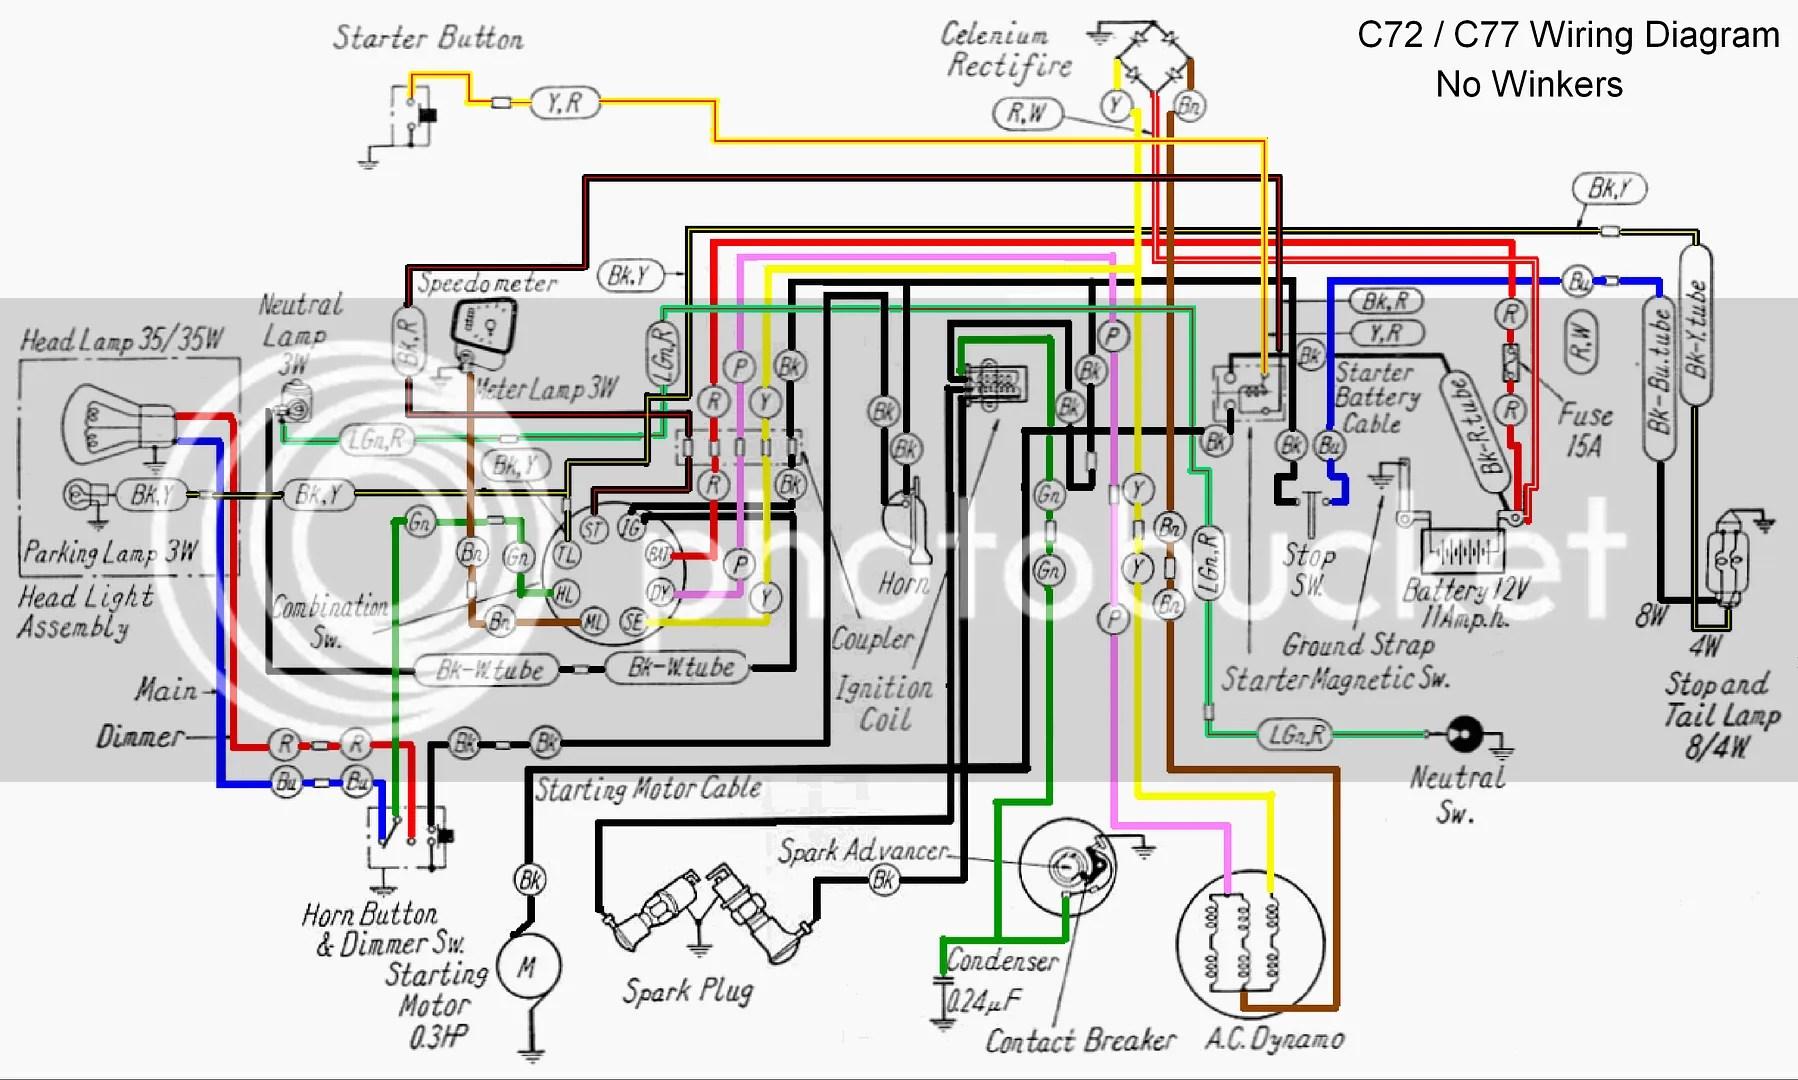 small resolution of honda nova wiring diagram simple wiring diagram 72 chevy nova starter wiring diagram honda nova wiring